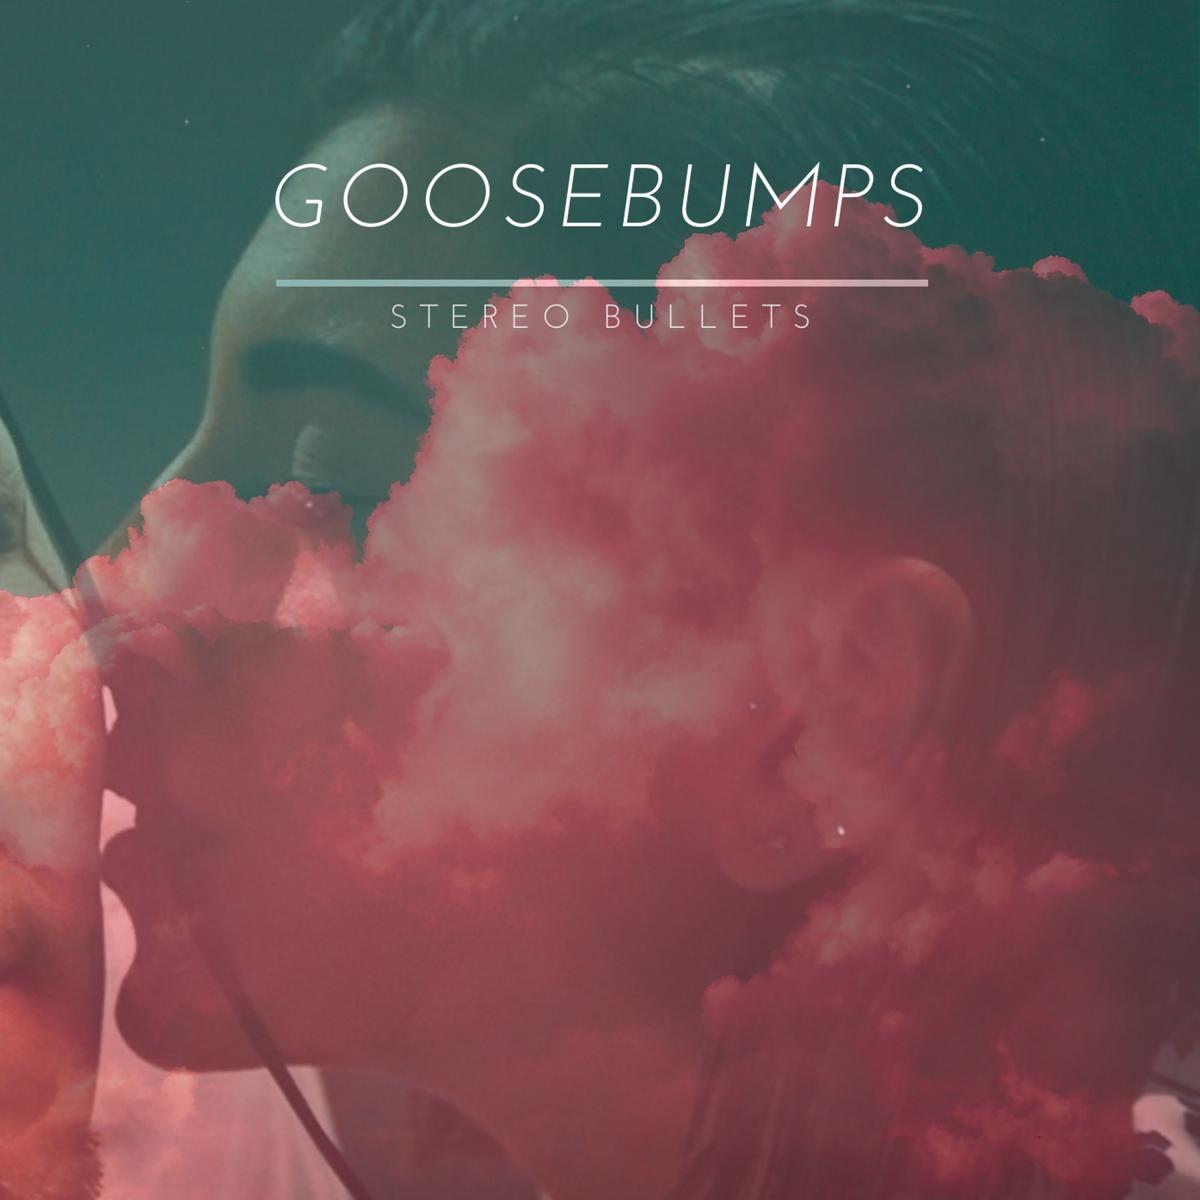 stereo-bullets-goosebumps-single-review-video-premiere